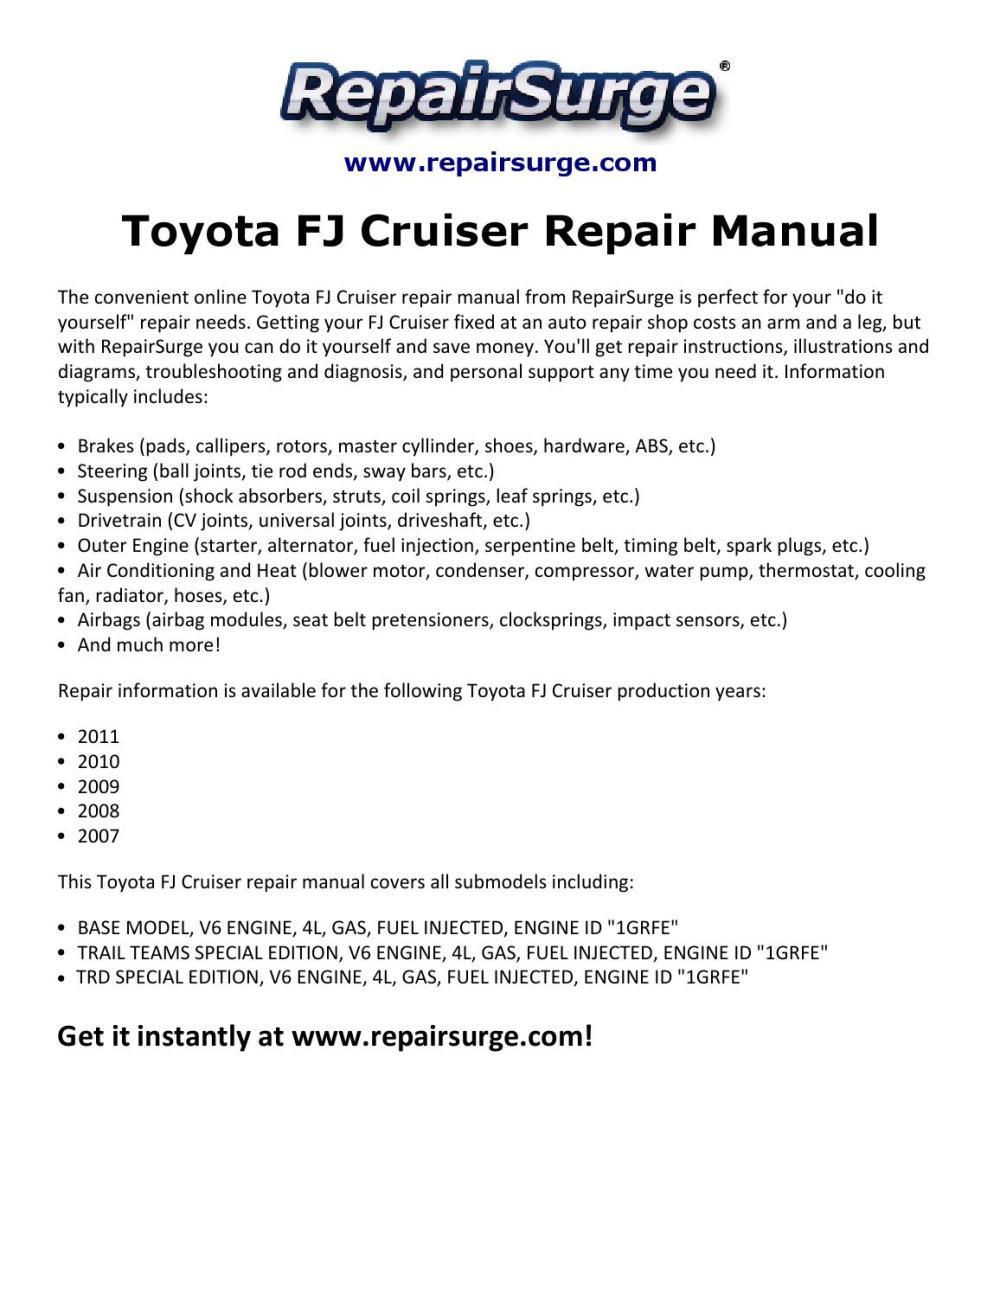 medium resolution of fj cruiser repair manual 2007